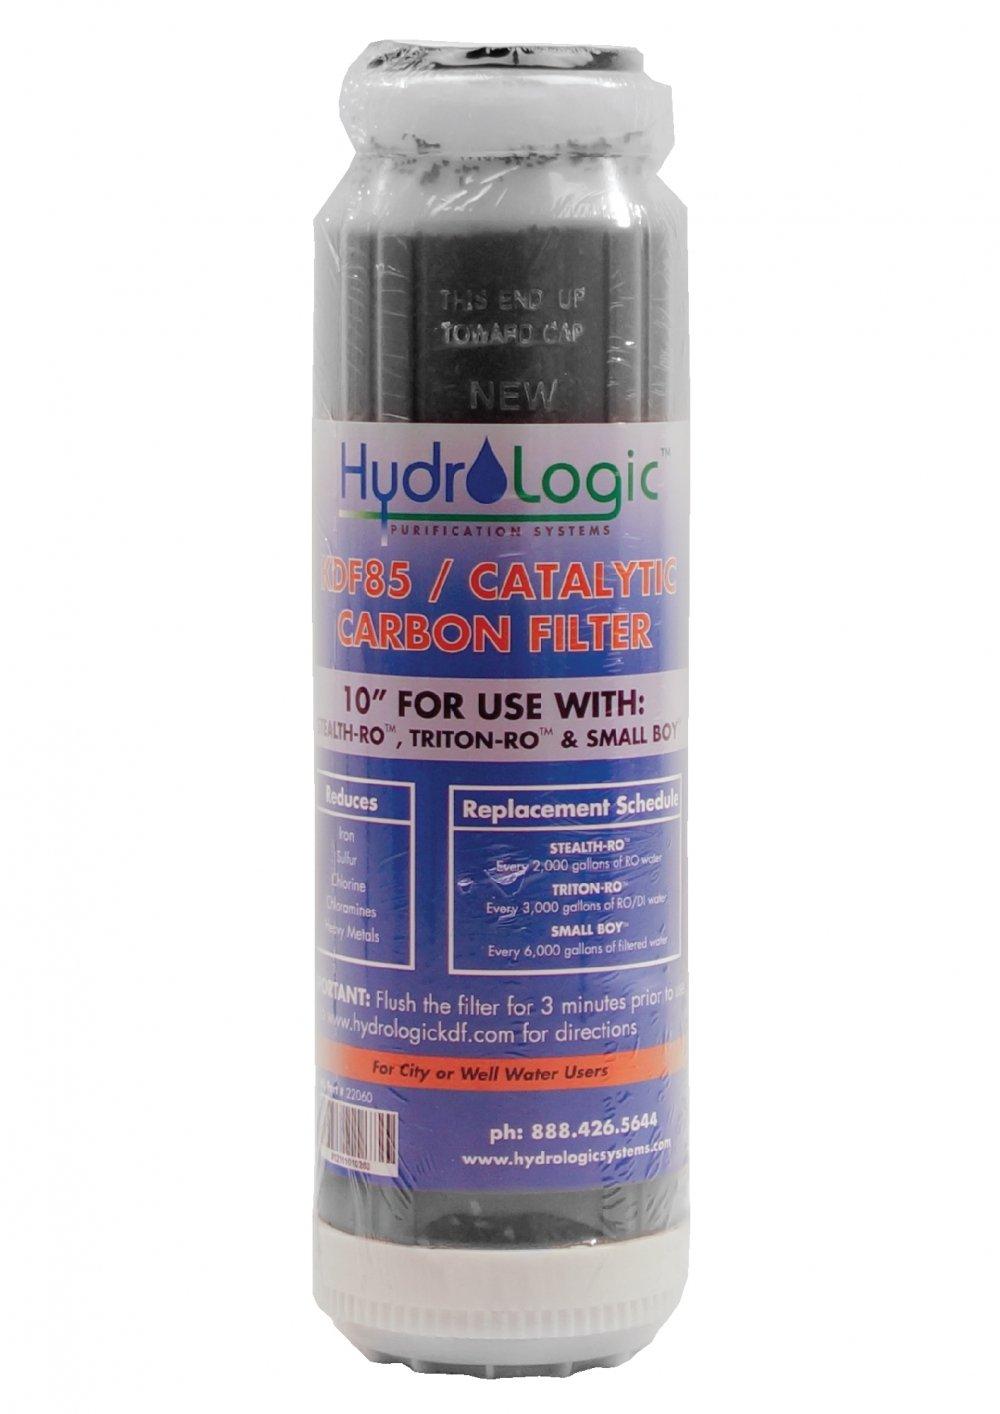 Hydro logic Stealth KDF85 Carbon Filter 728975